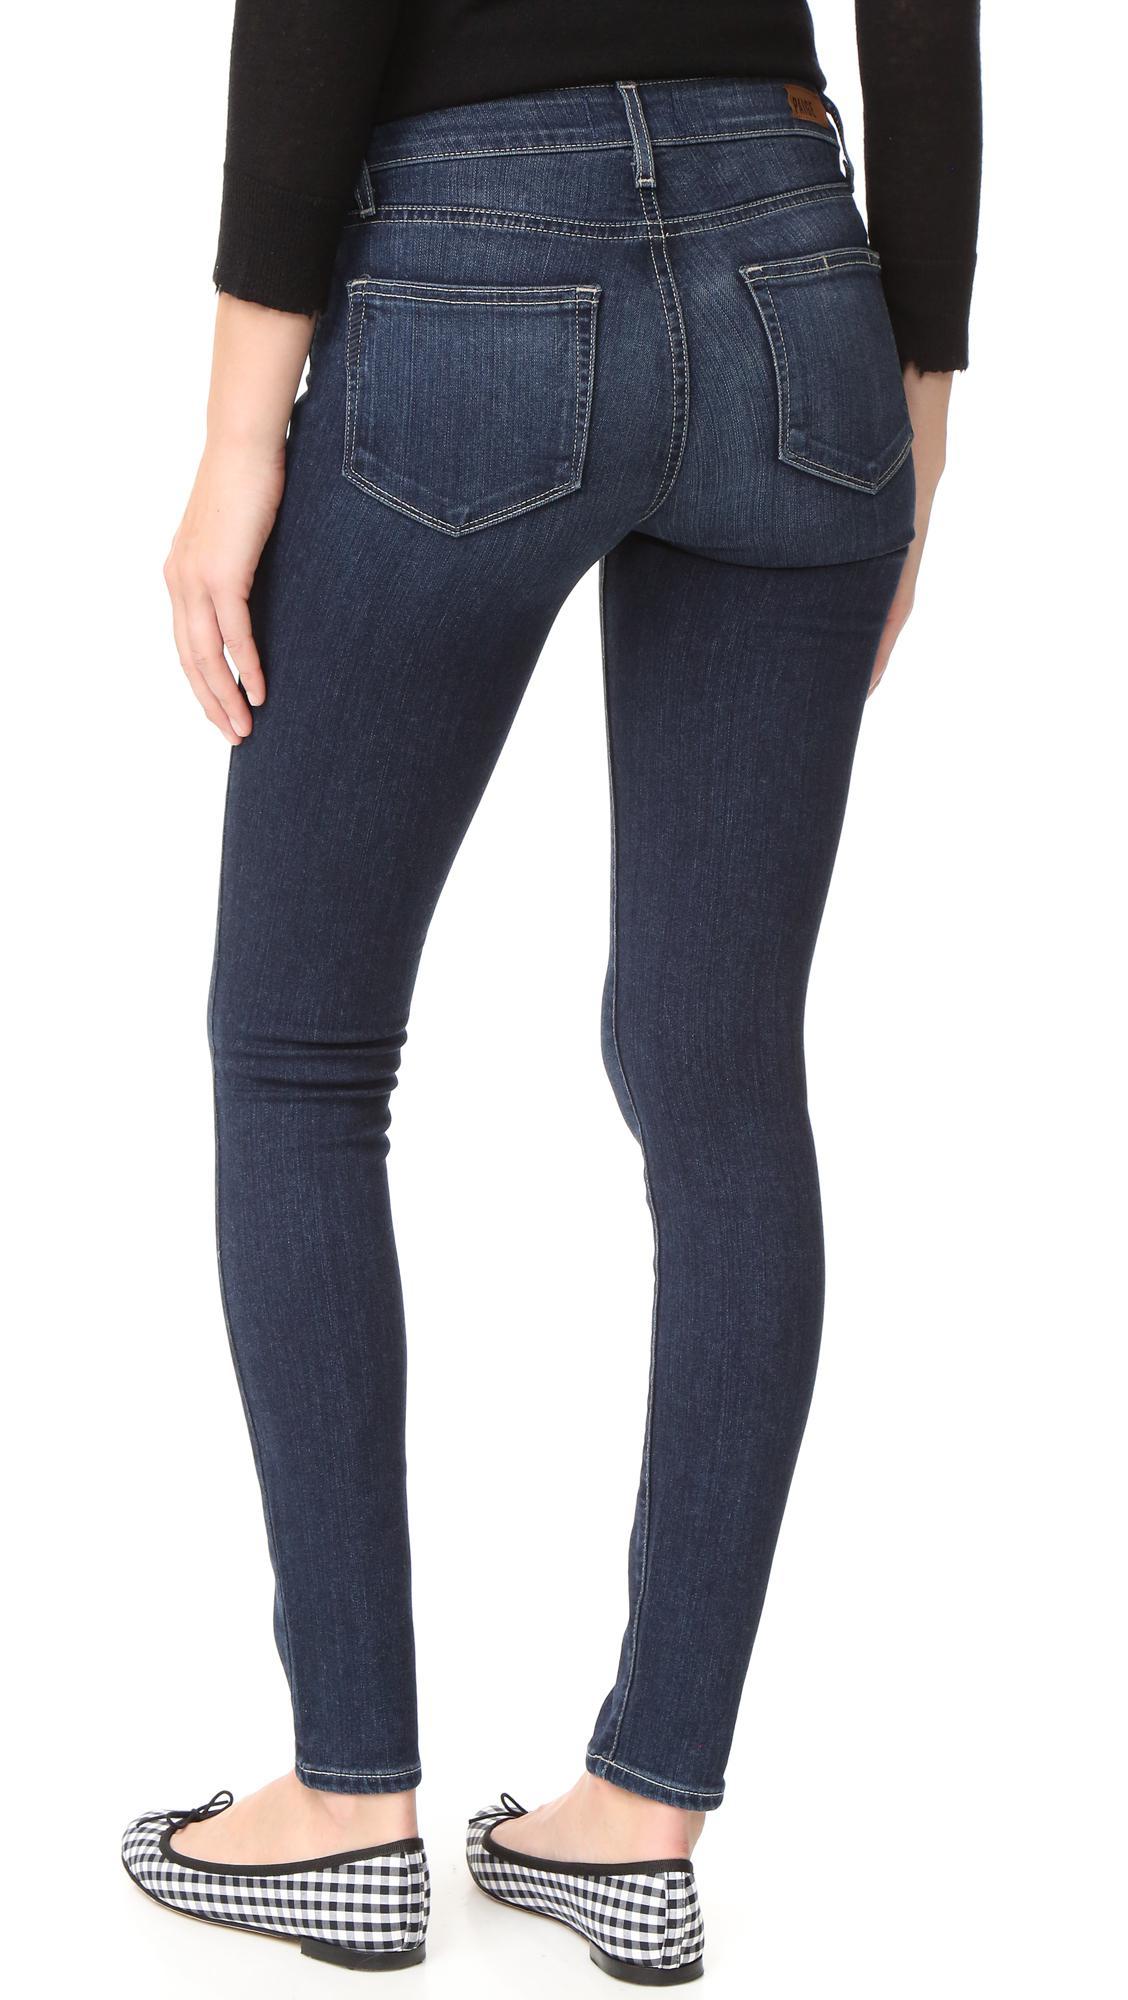 PAIGE Denim Transcend Vedugo Ultra Skinny Jeans in Blue